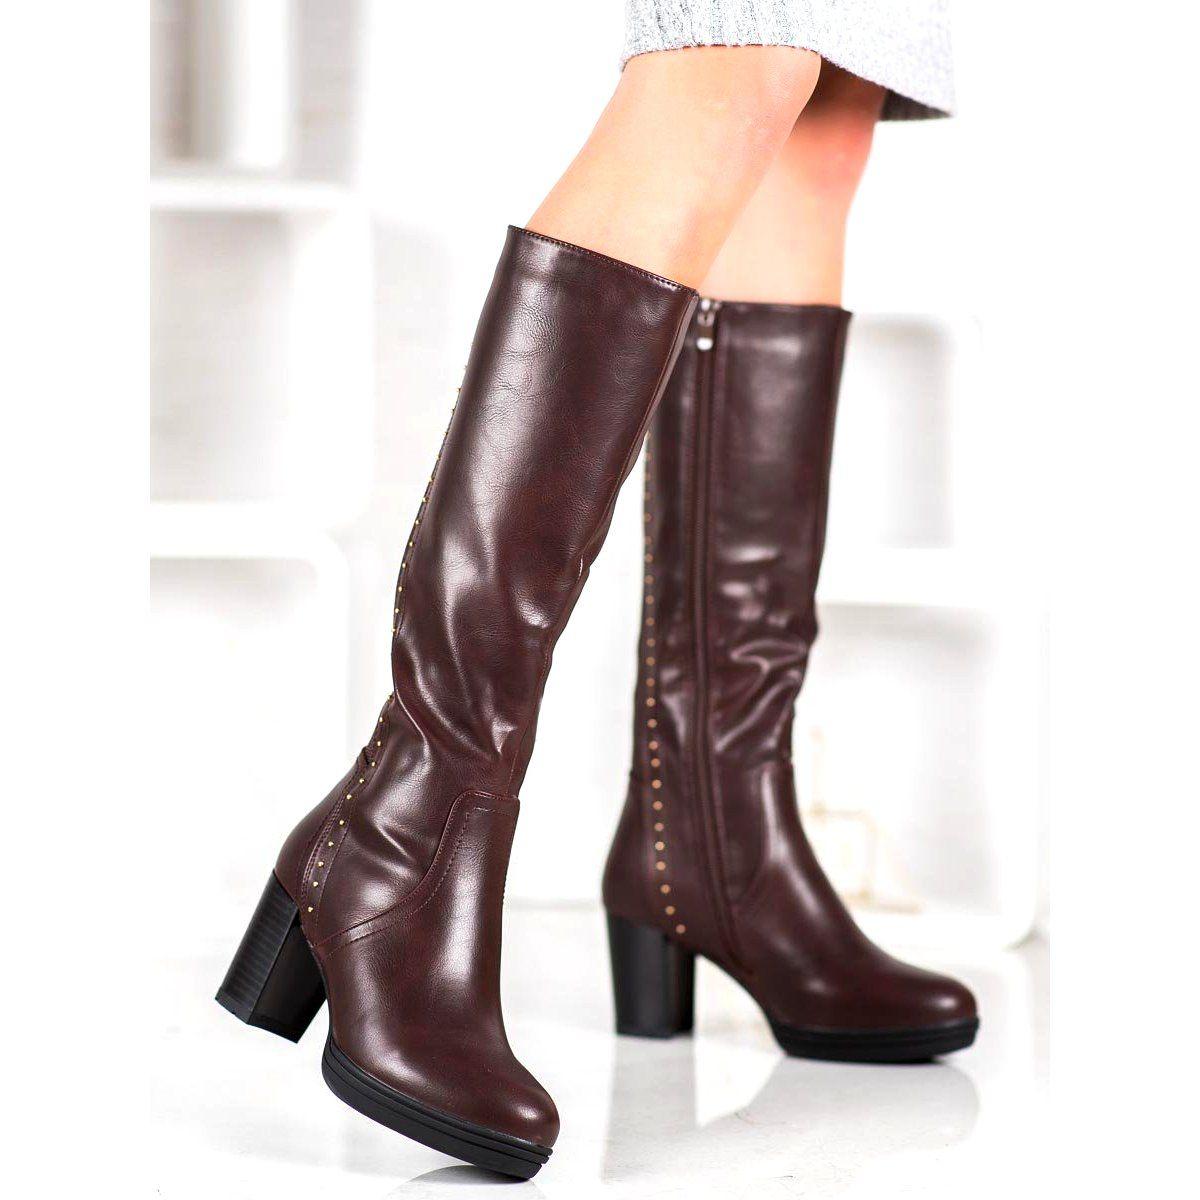 J Star Brazowe Kozaki Na Obcasie Heels Boots Stiletto Boot